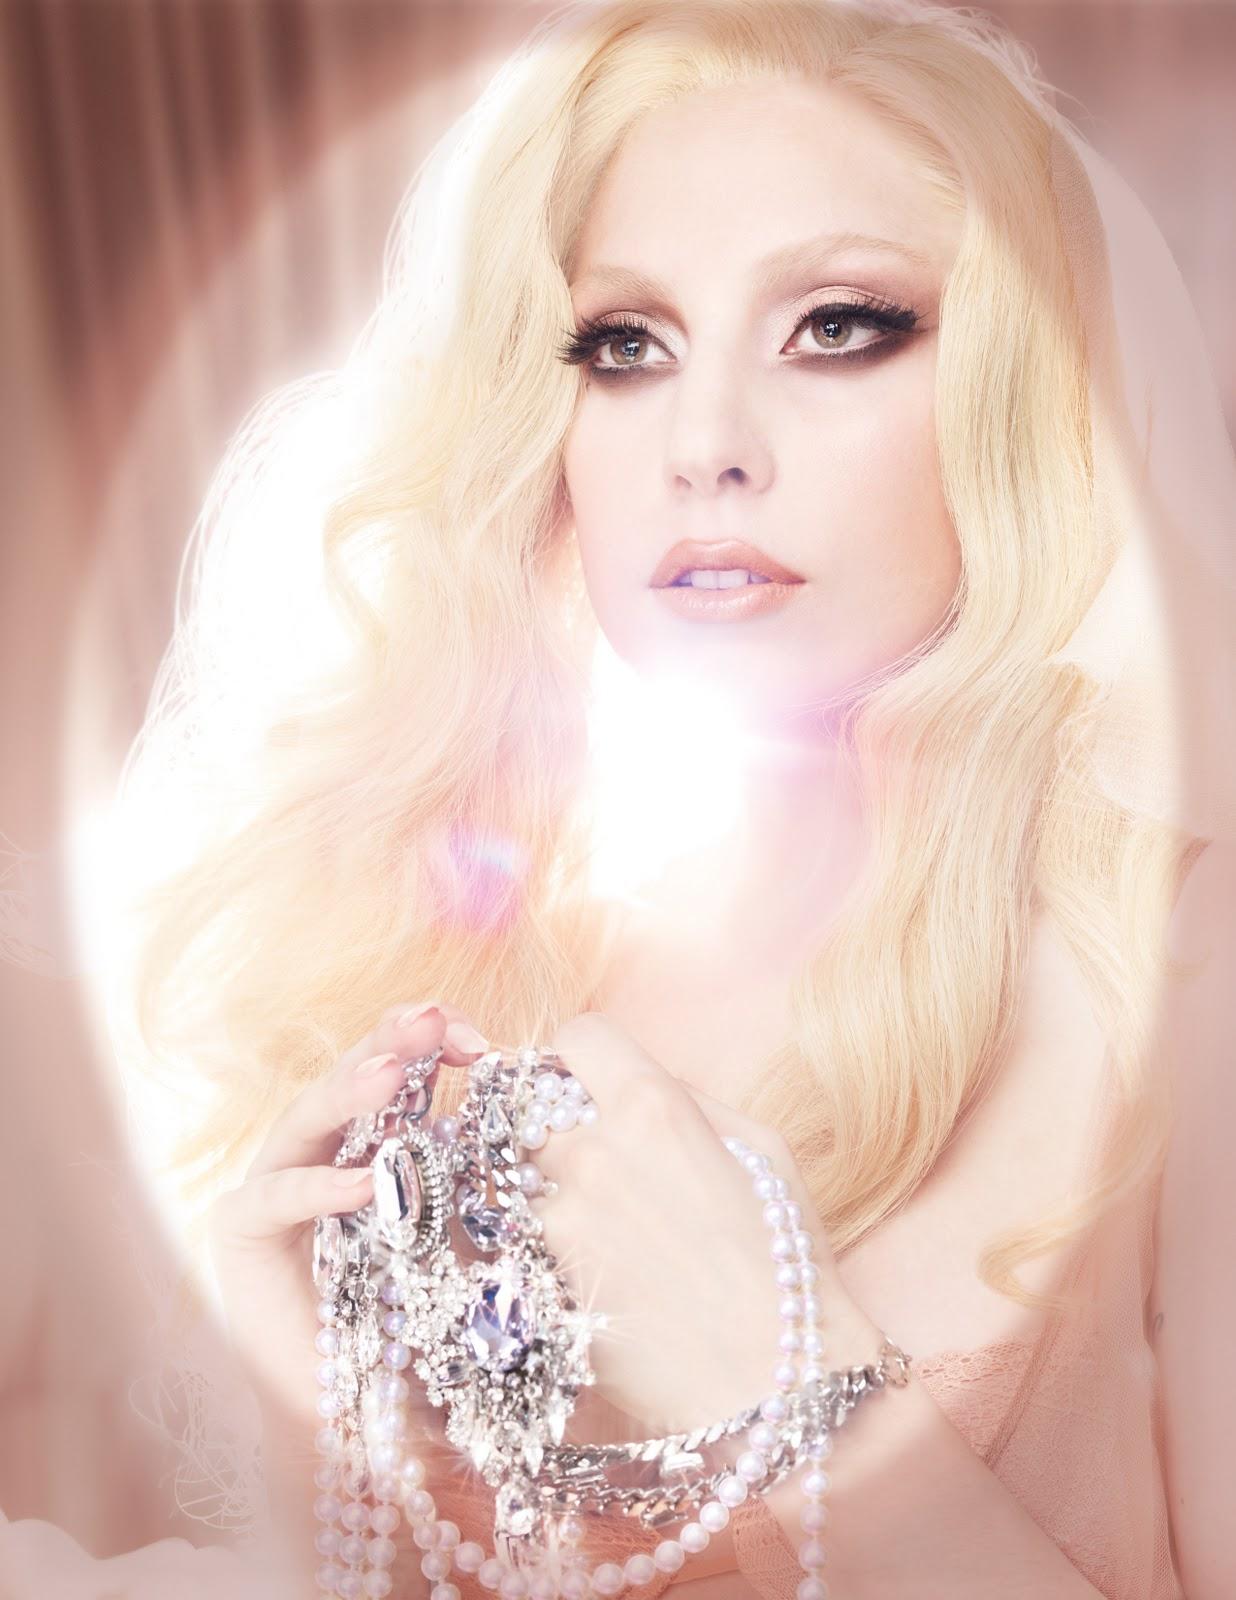 http://1.bp.blogspot.com/-ZozOh4Yu4xI/TV1GNHEG0GI/AAAAAAAARao/e6KC0bAAWSo/s1600/VivaGlam-Beauty-300.jpg